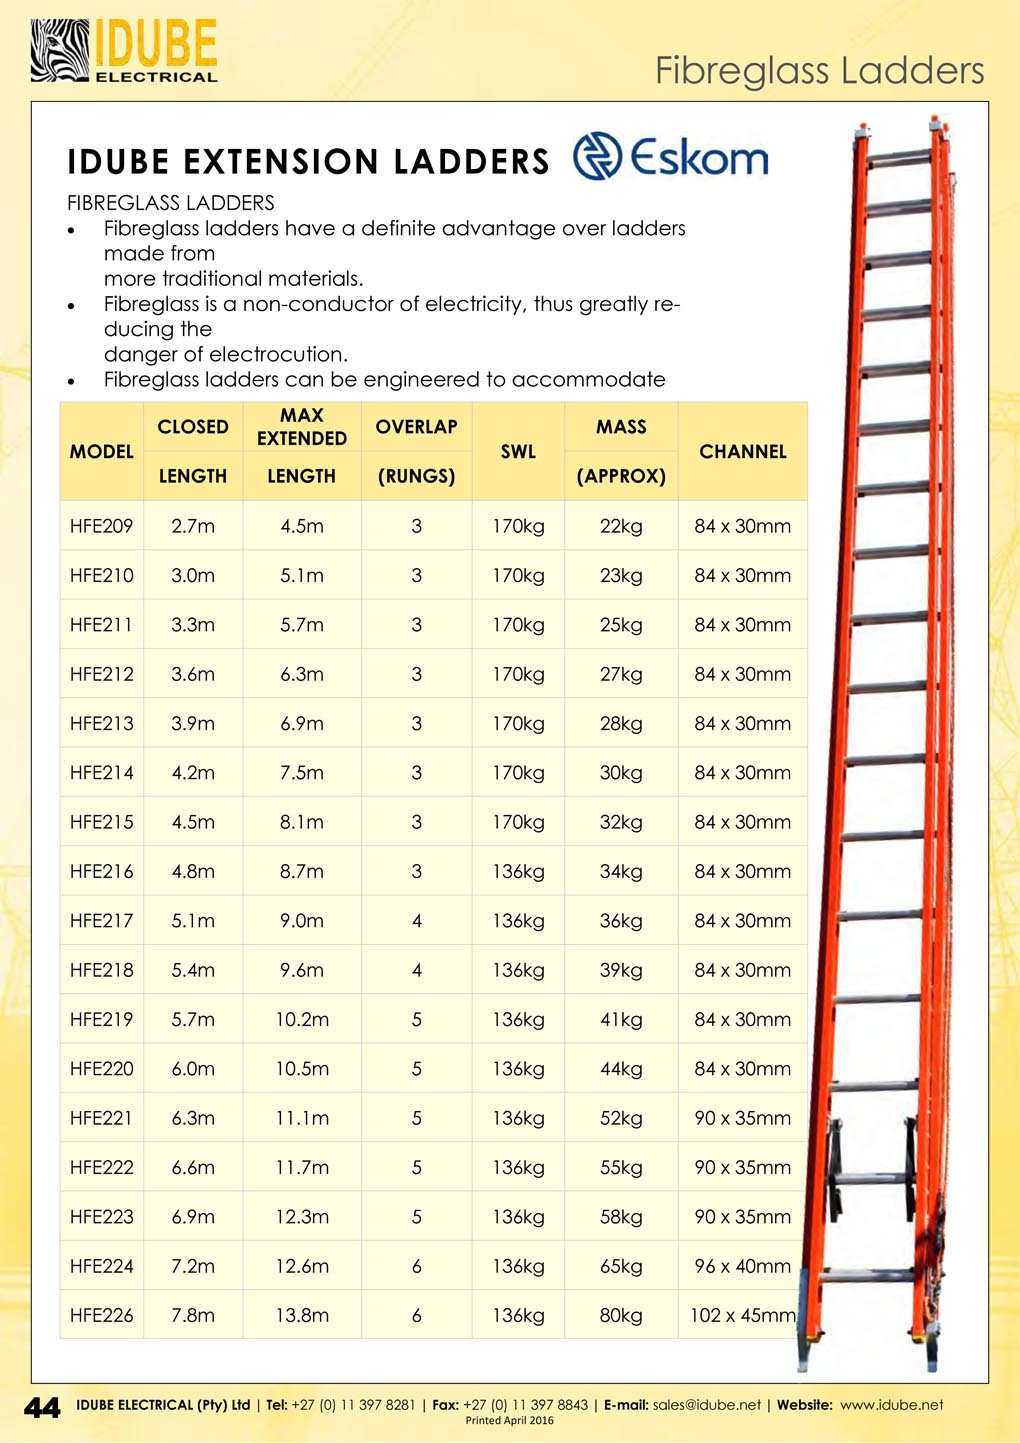 Fibreglass Extension Ladders (Eskom) - 1020 x 1443